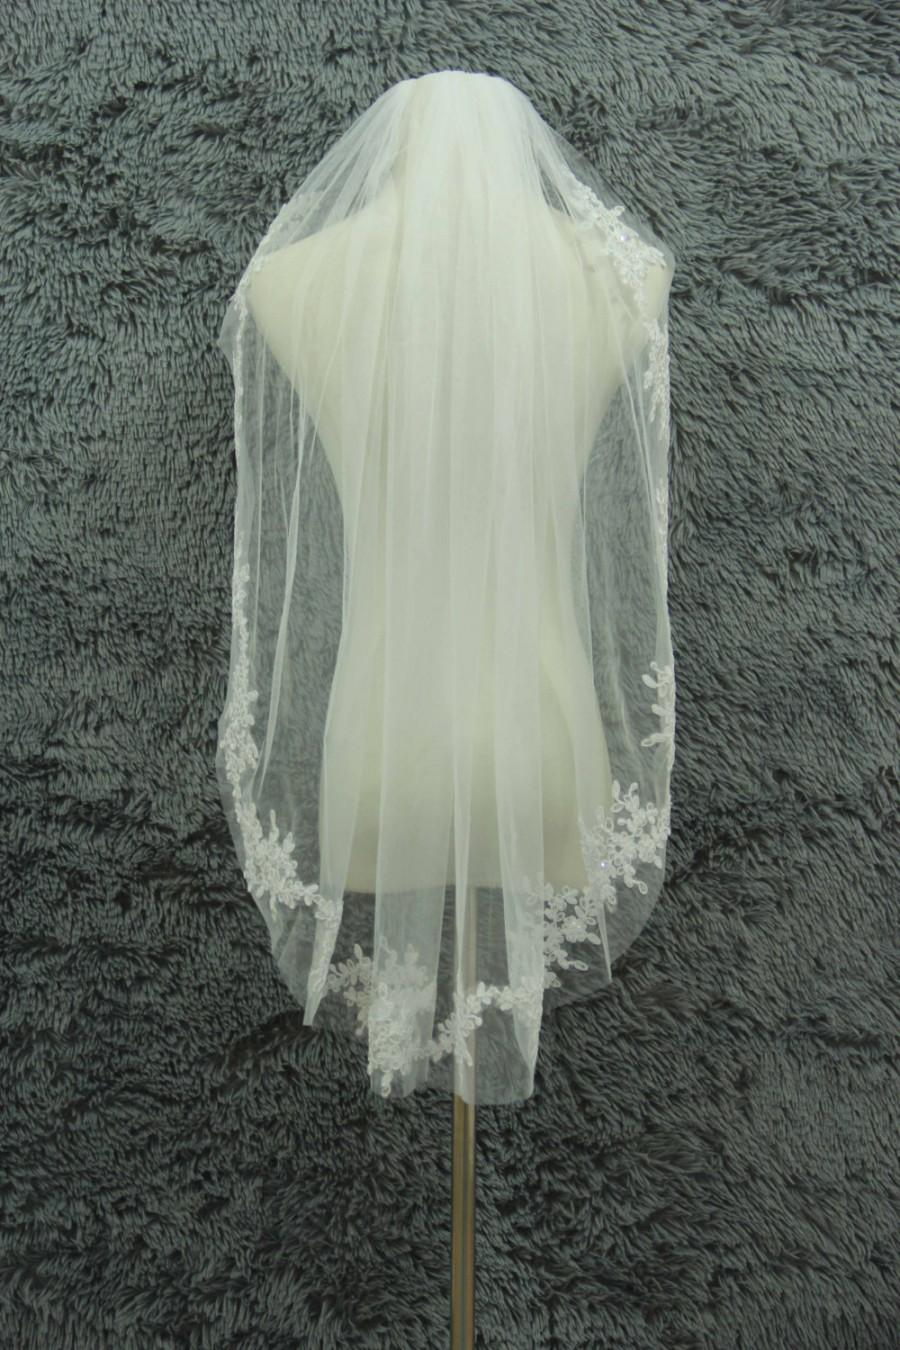 Свадьба - 1 Layer Applique lace veil Wedding veil White Ivory Bridal Veil Elbow veil Combs veil Crystal lace veil